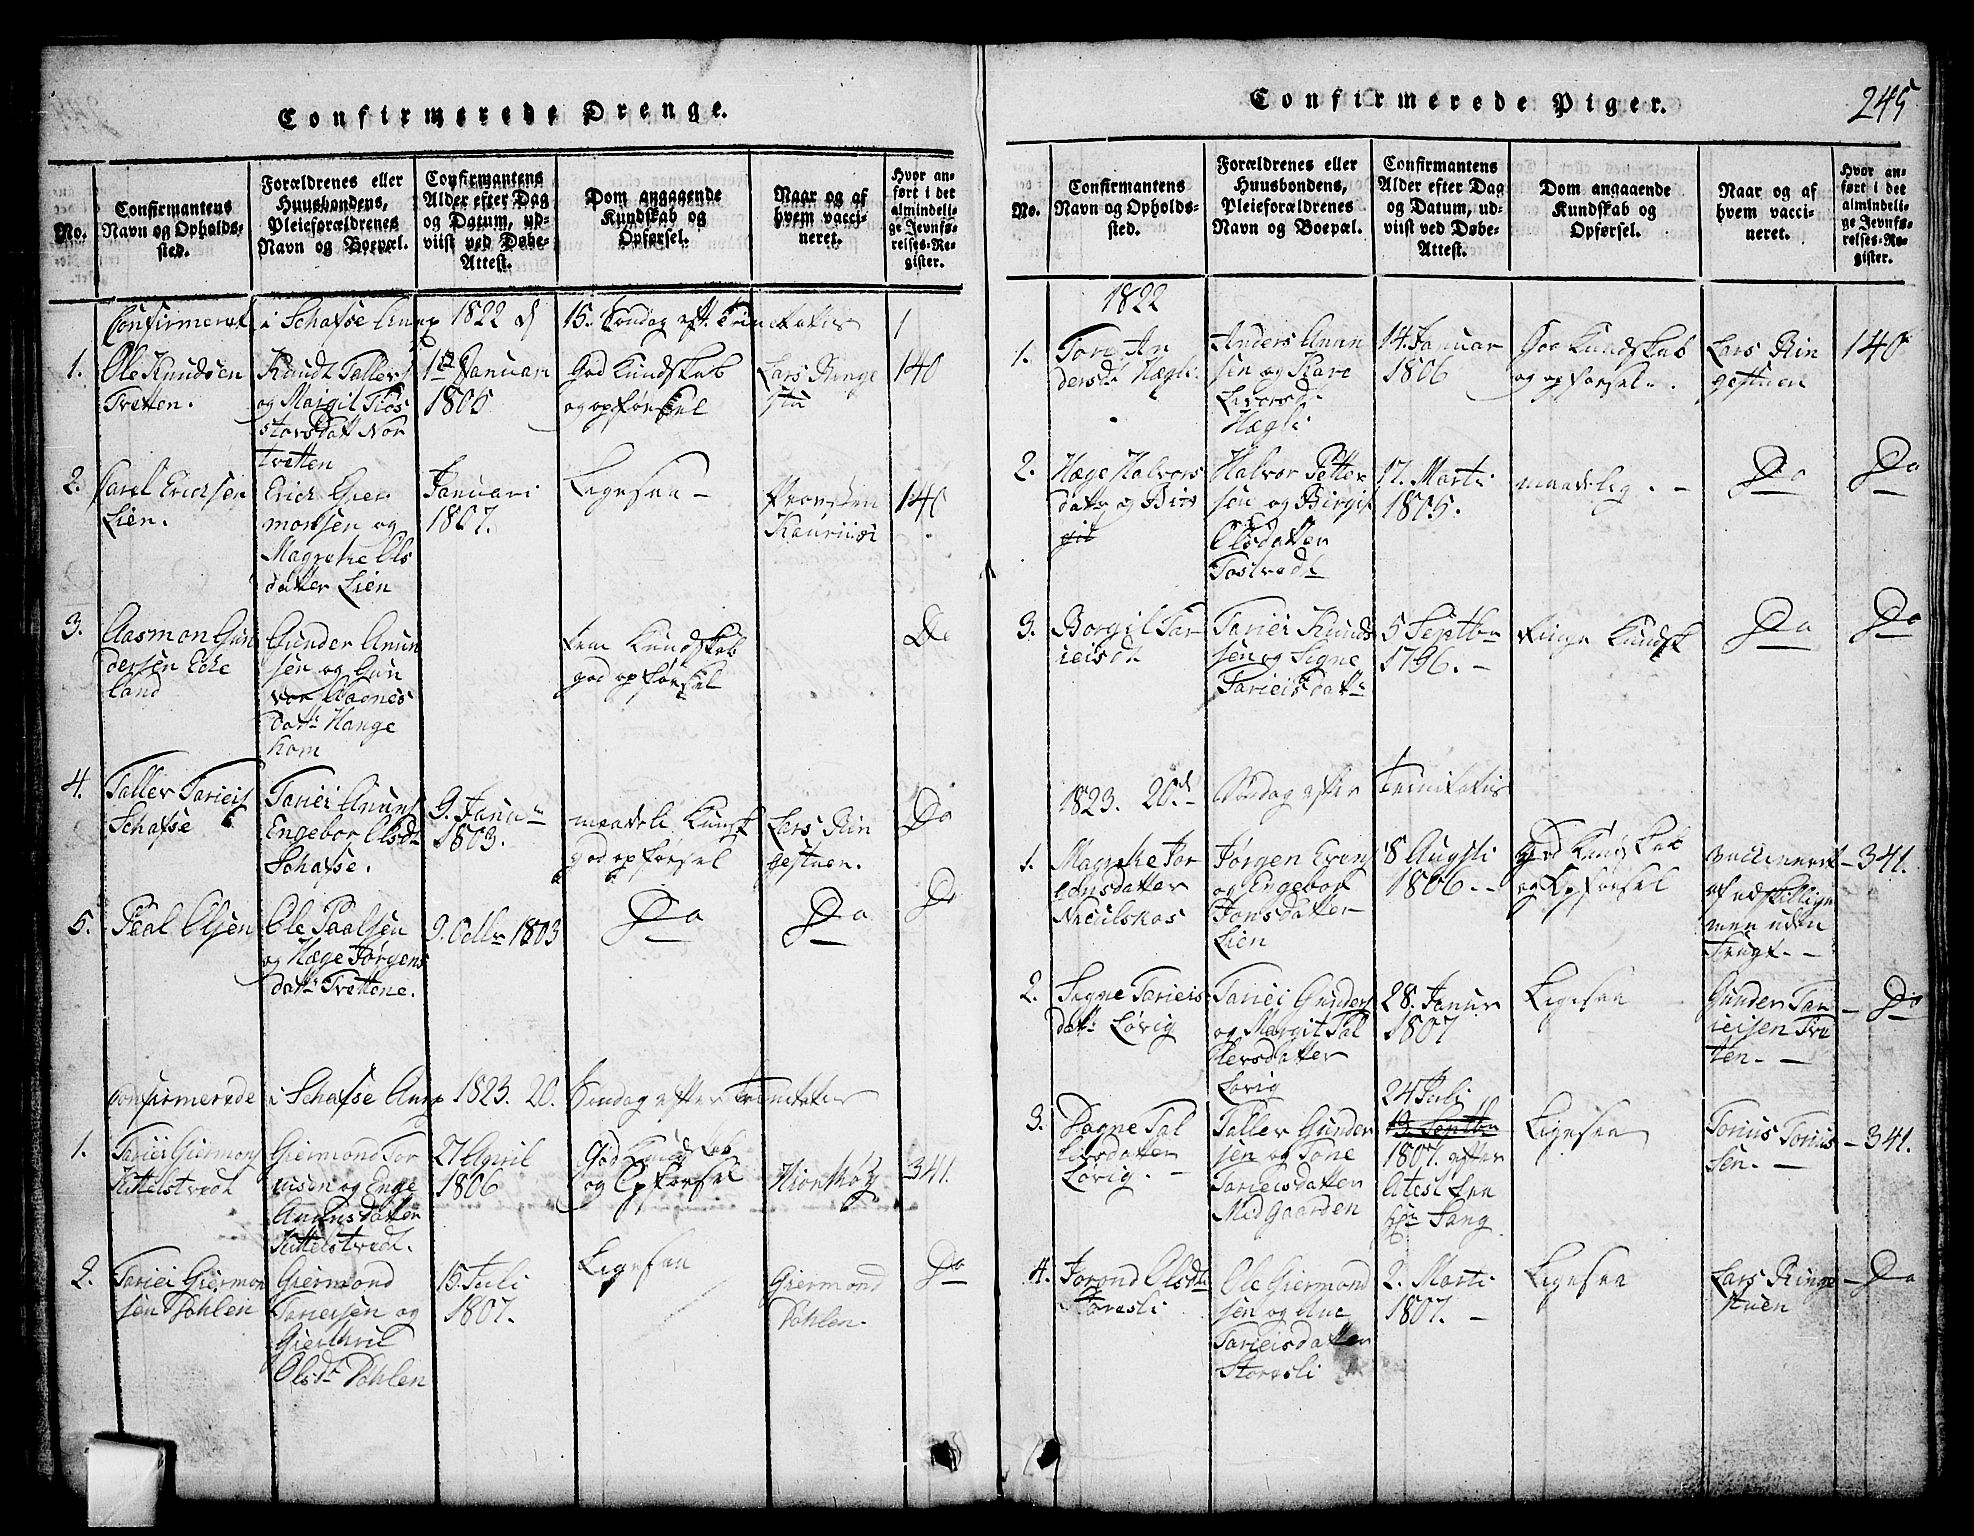 SAKO, Mo kirkebøker, G/Gb/L0001: Klokkerbok nr. II 1, 1814-1843, s. 245